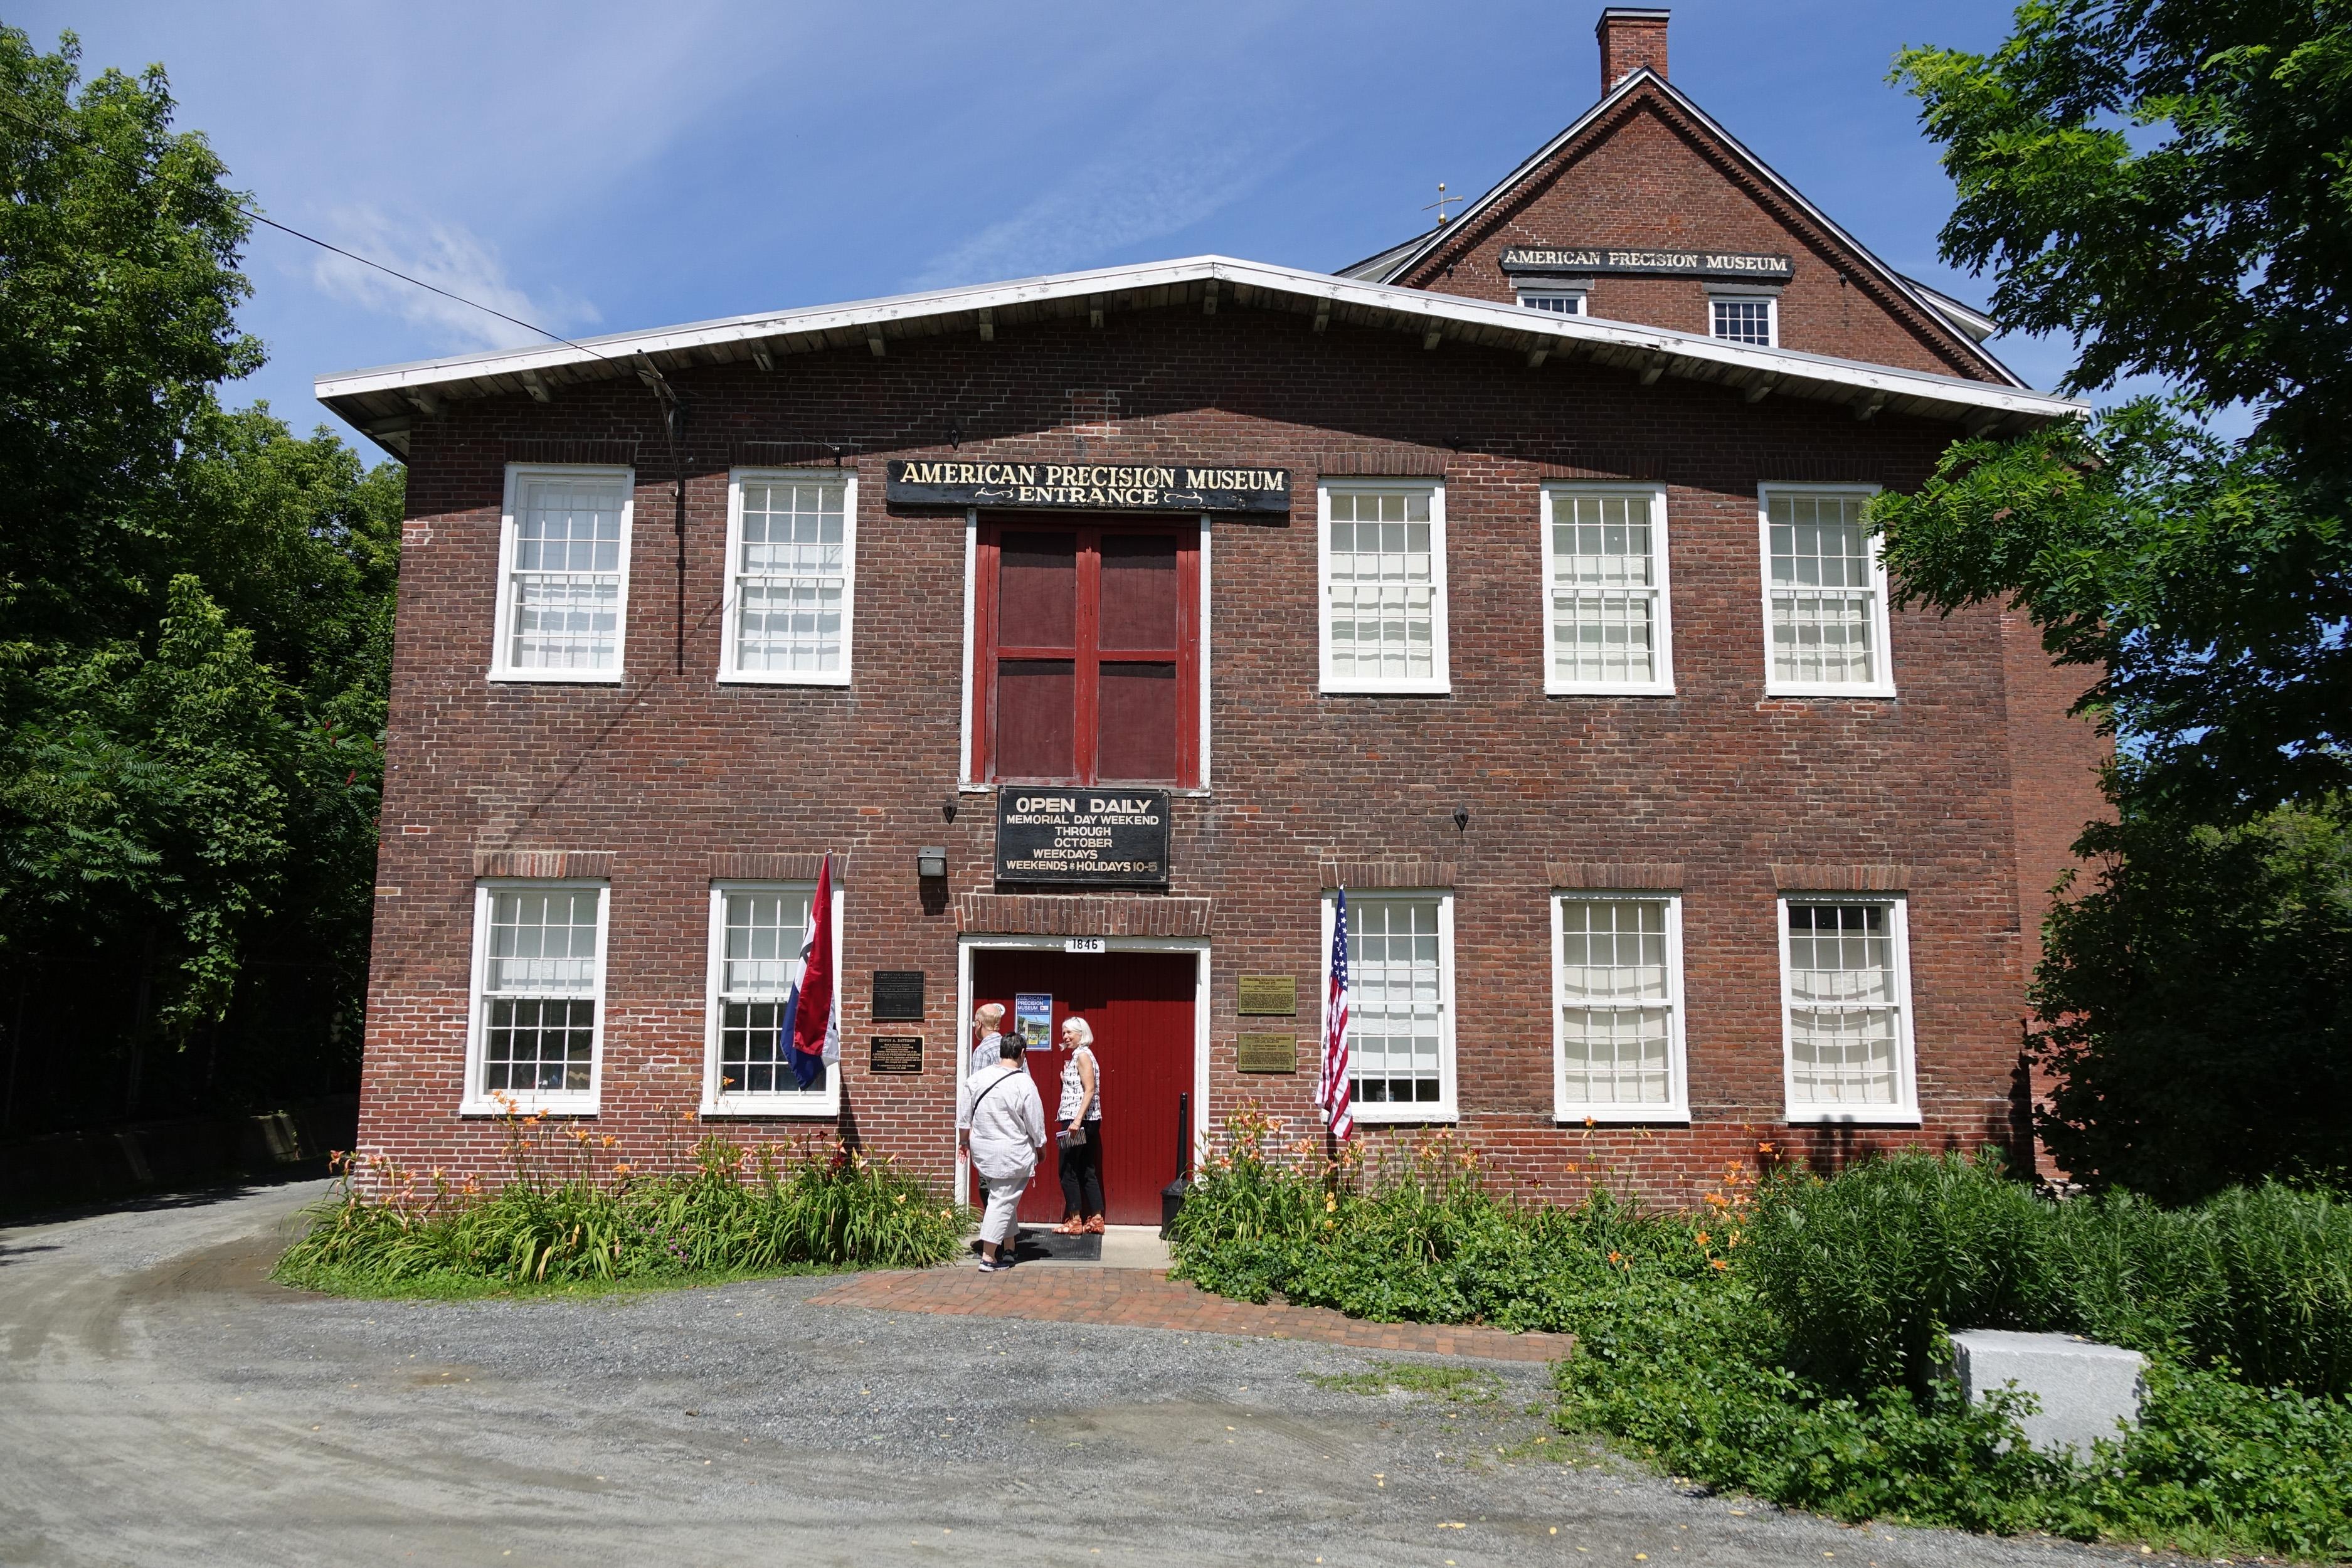 Windsor, American Precision Museum